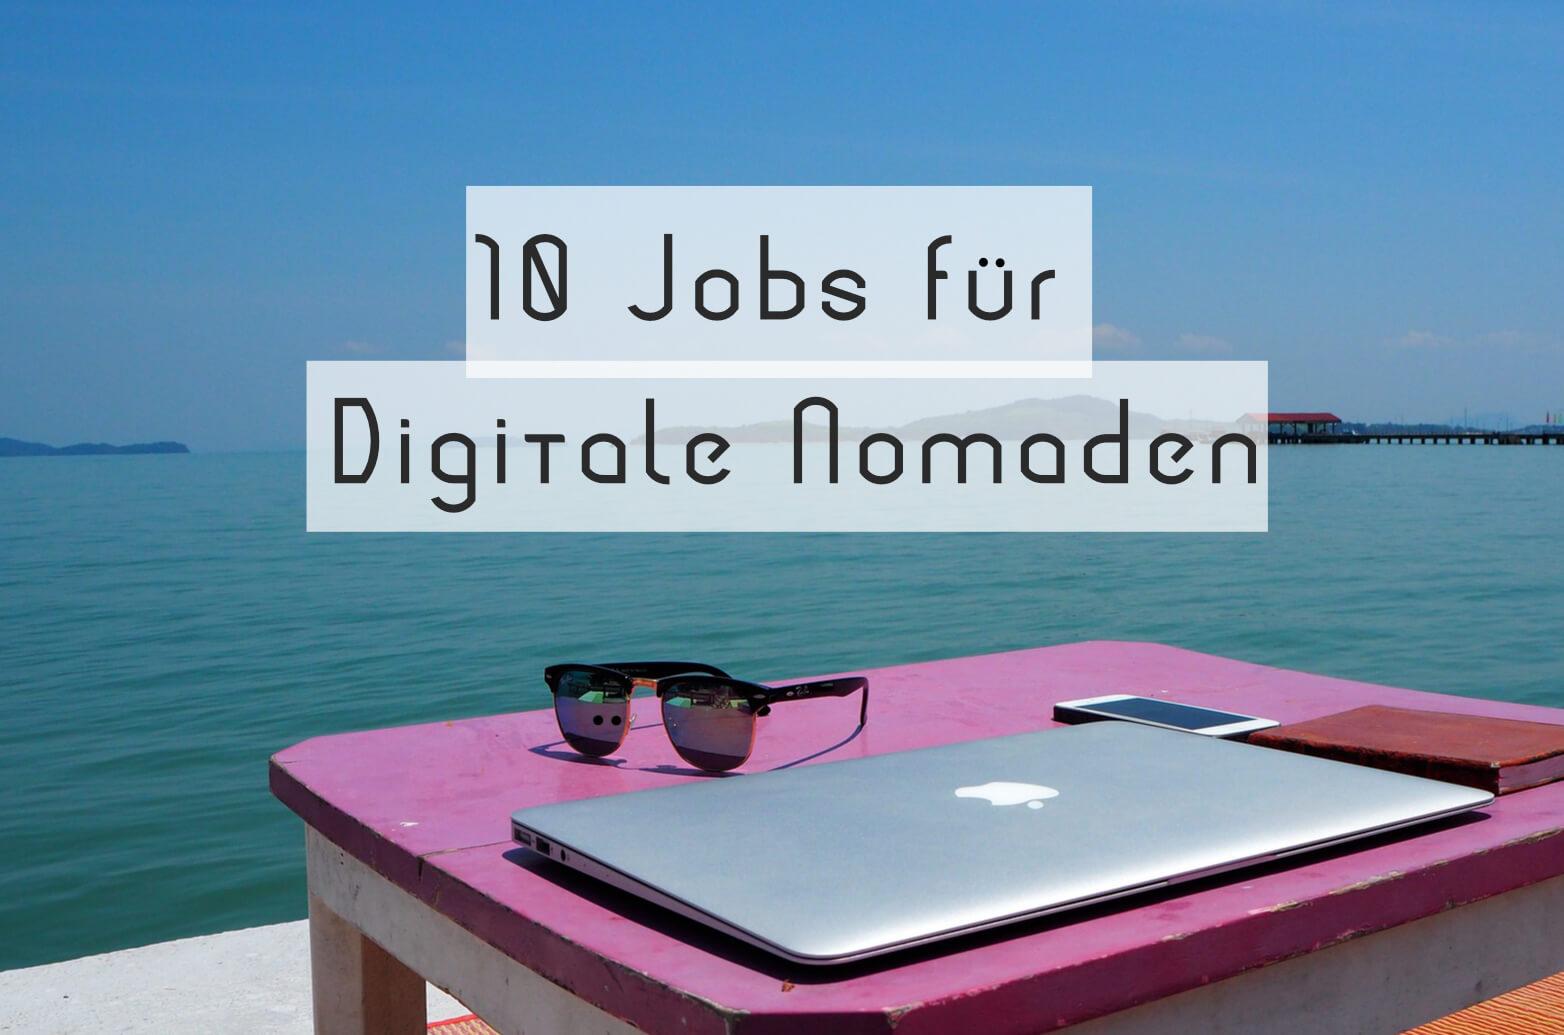 Digitale Nomaden Jobs